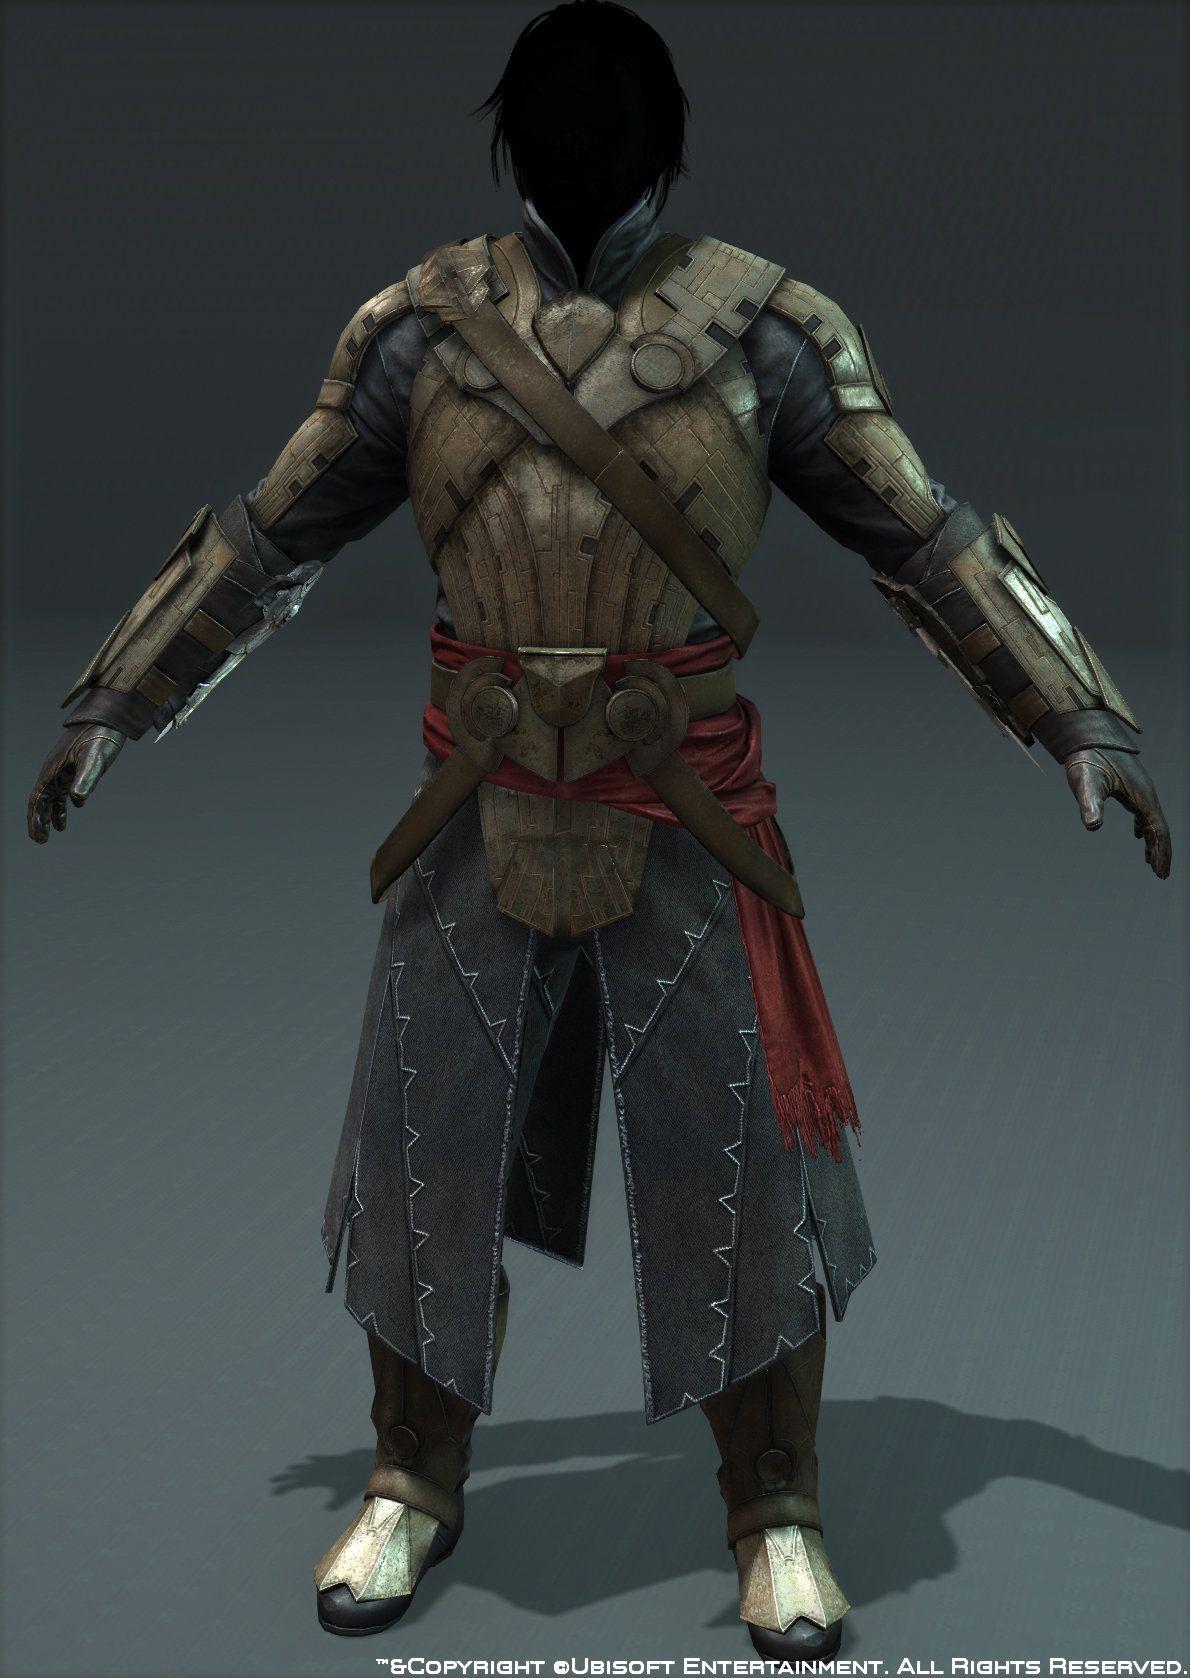 Assasin S Creed Black Flag Edward Kenway Mayan Outfit Mathieu Goulet Assassins Creed Black Flag Assassins Creed Artwork Assassins Creed